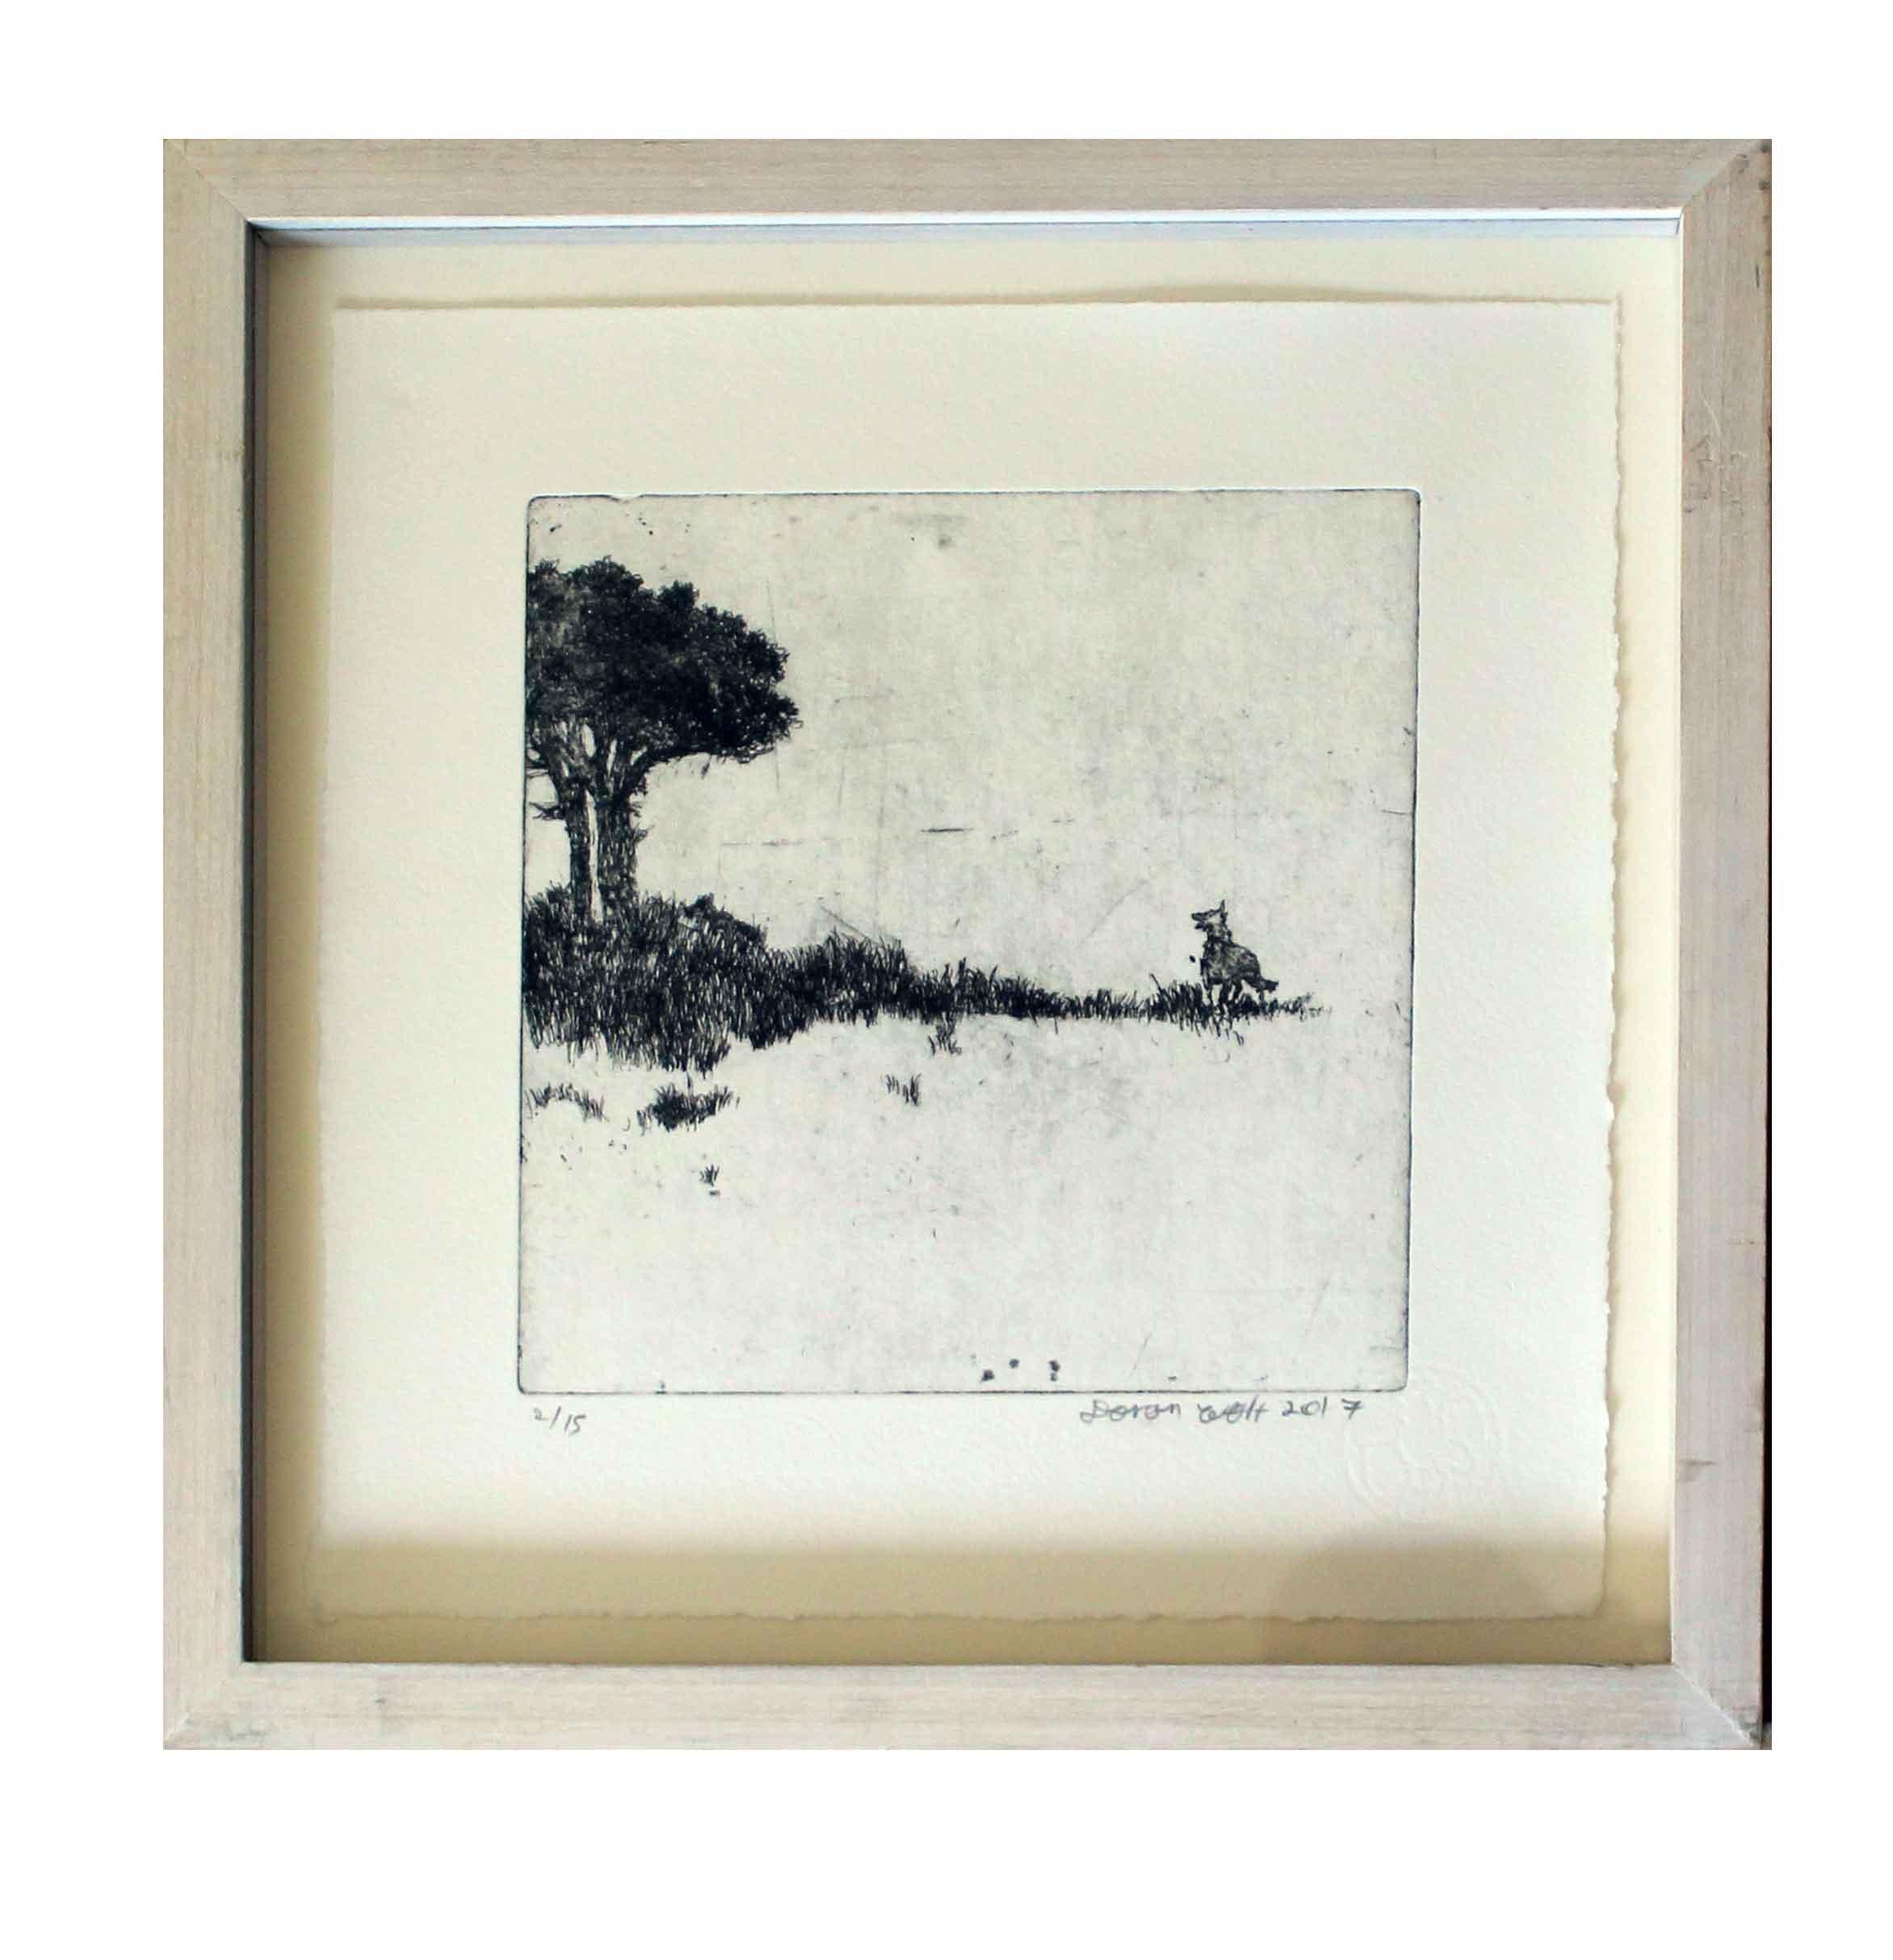 Landscape with a dog Image